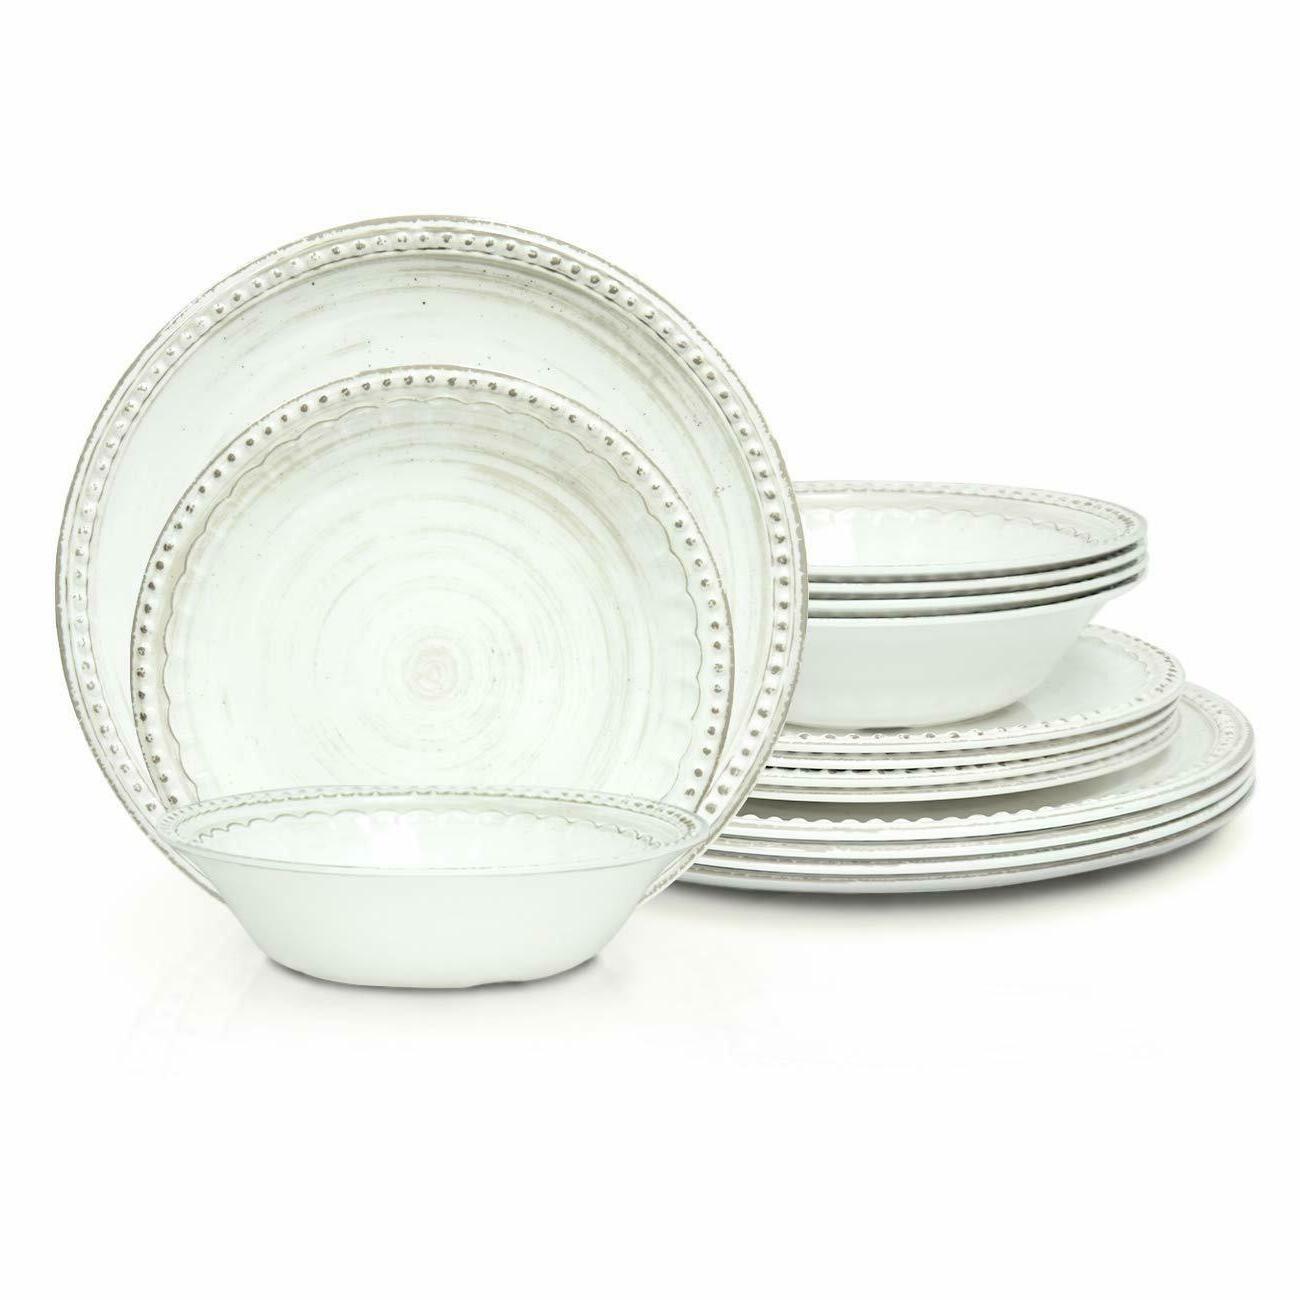 zak designs french country house melamine dinnerware